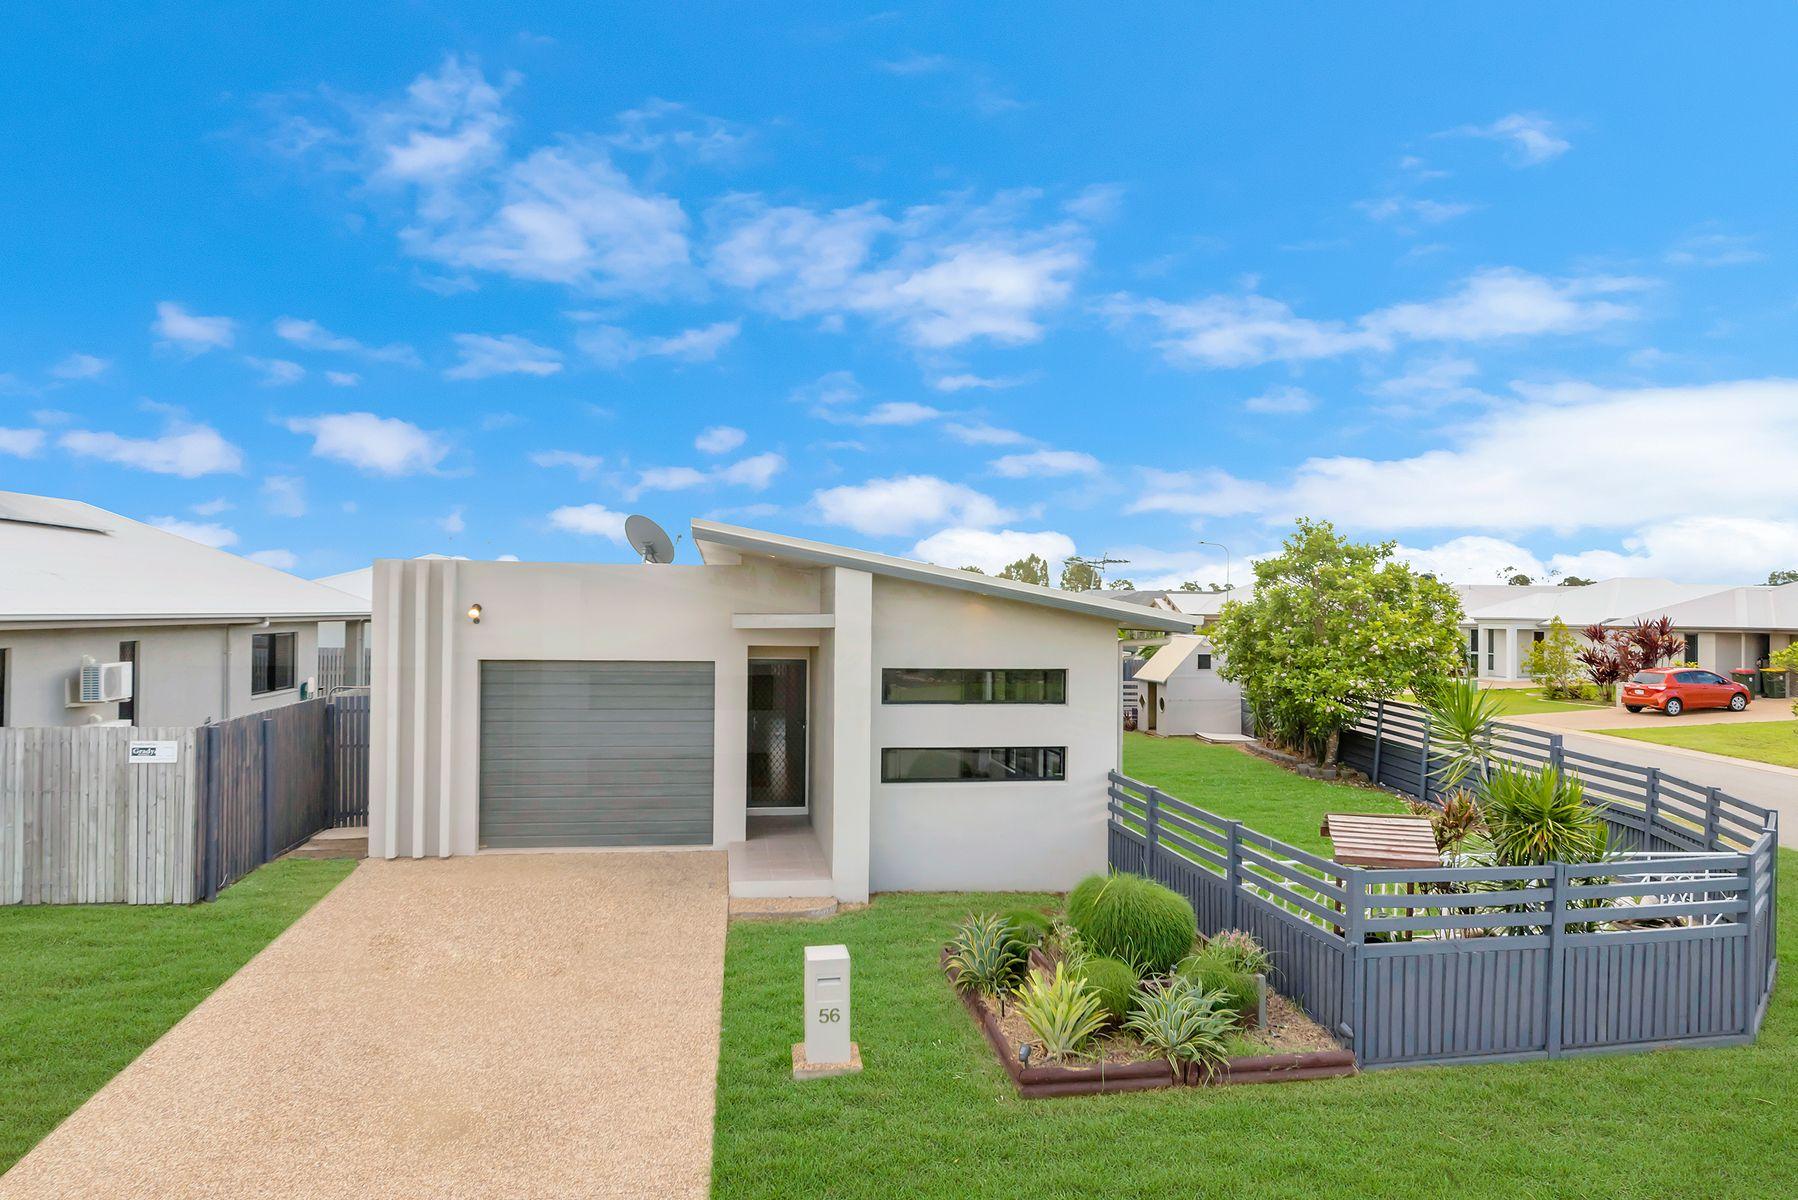 56-58 Iona Avenue, Burdell, QLD 4818